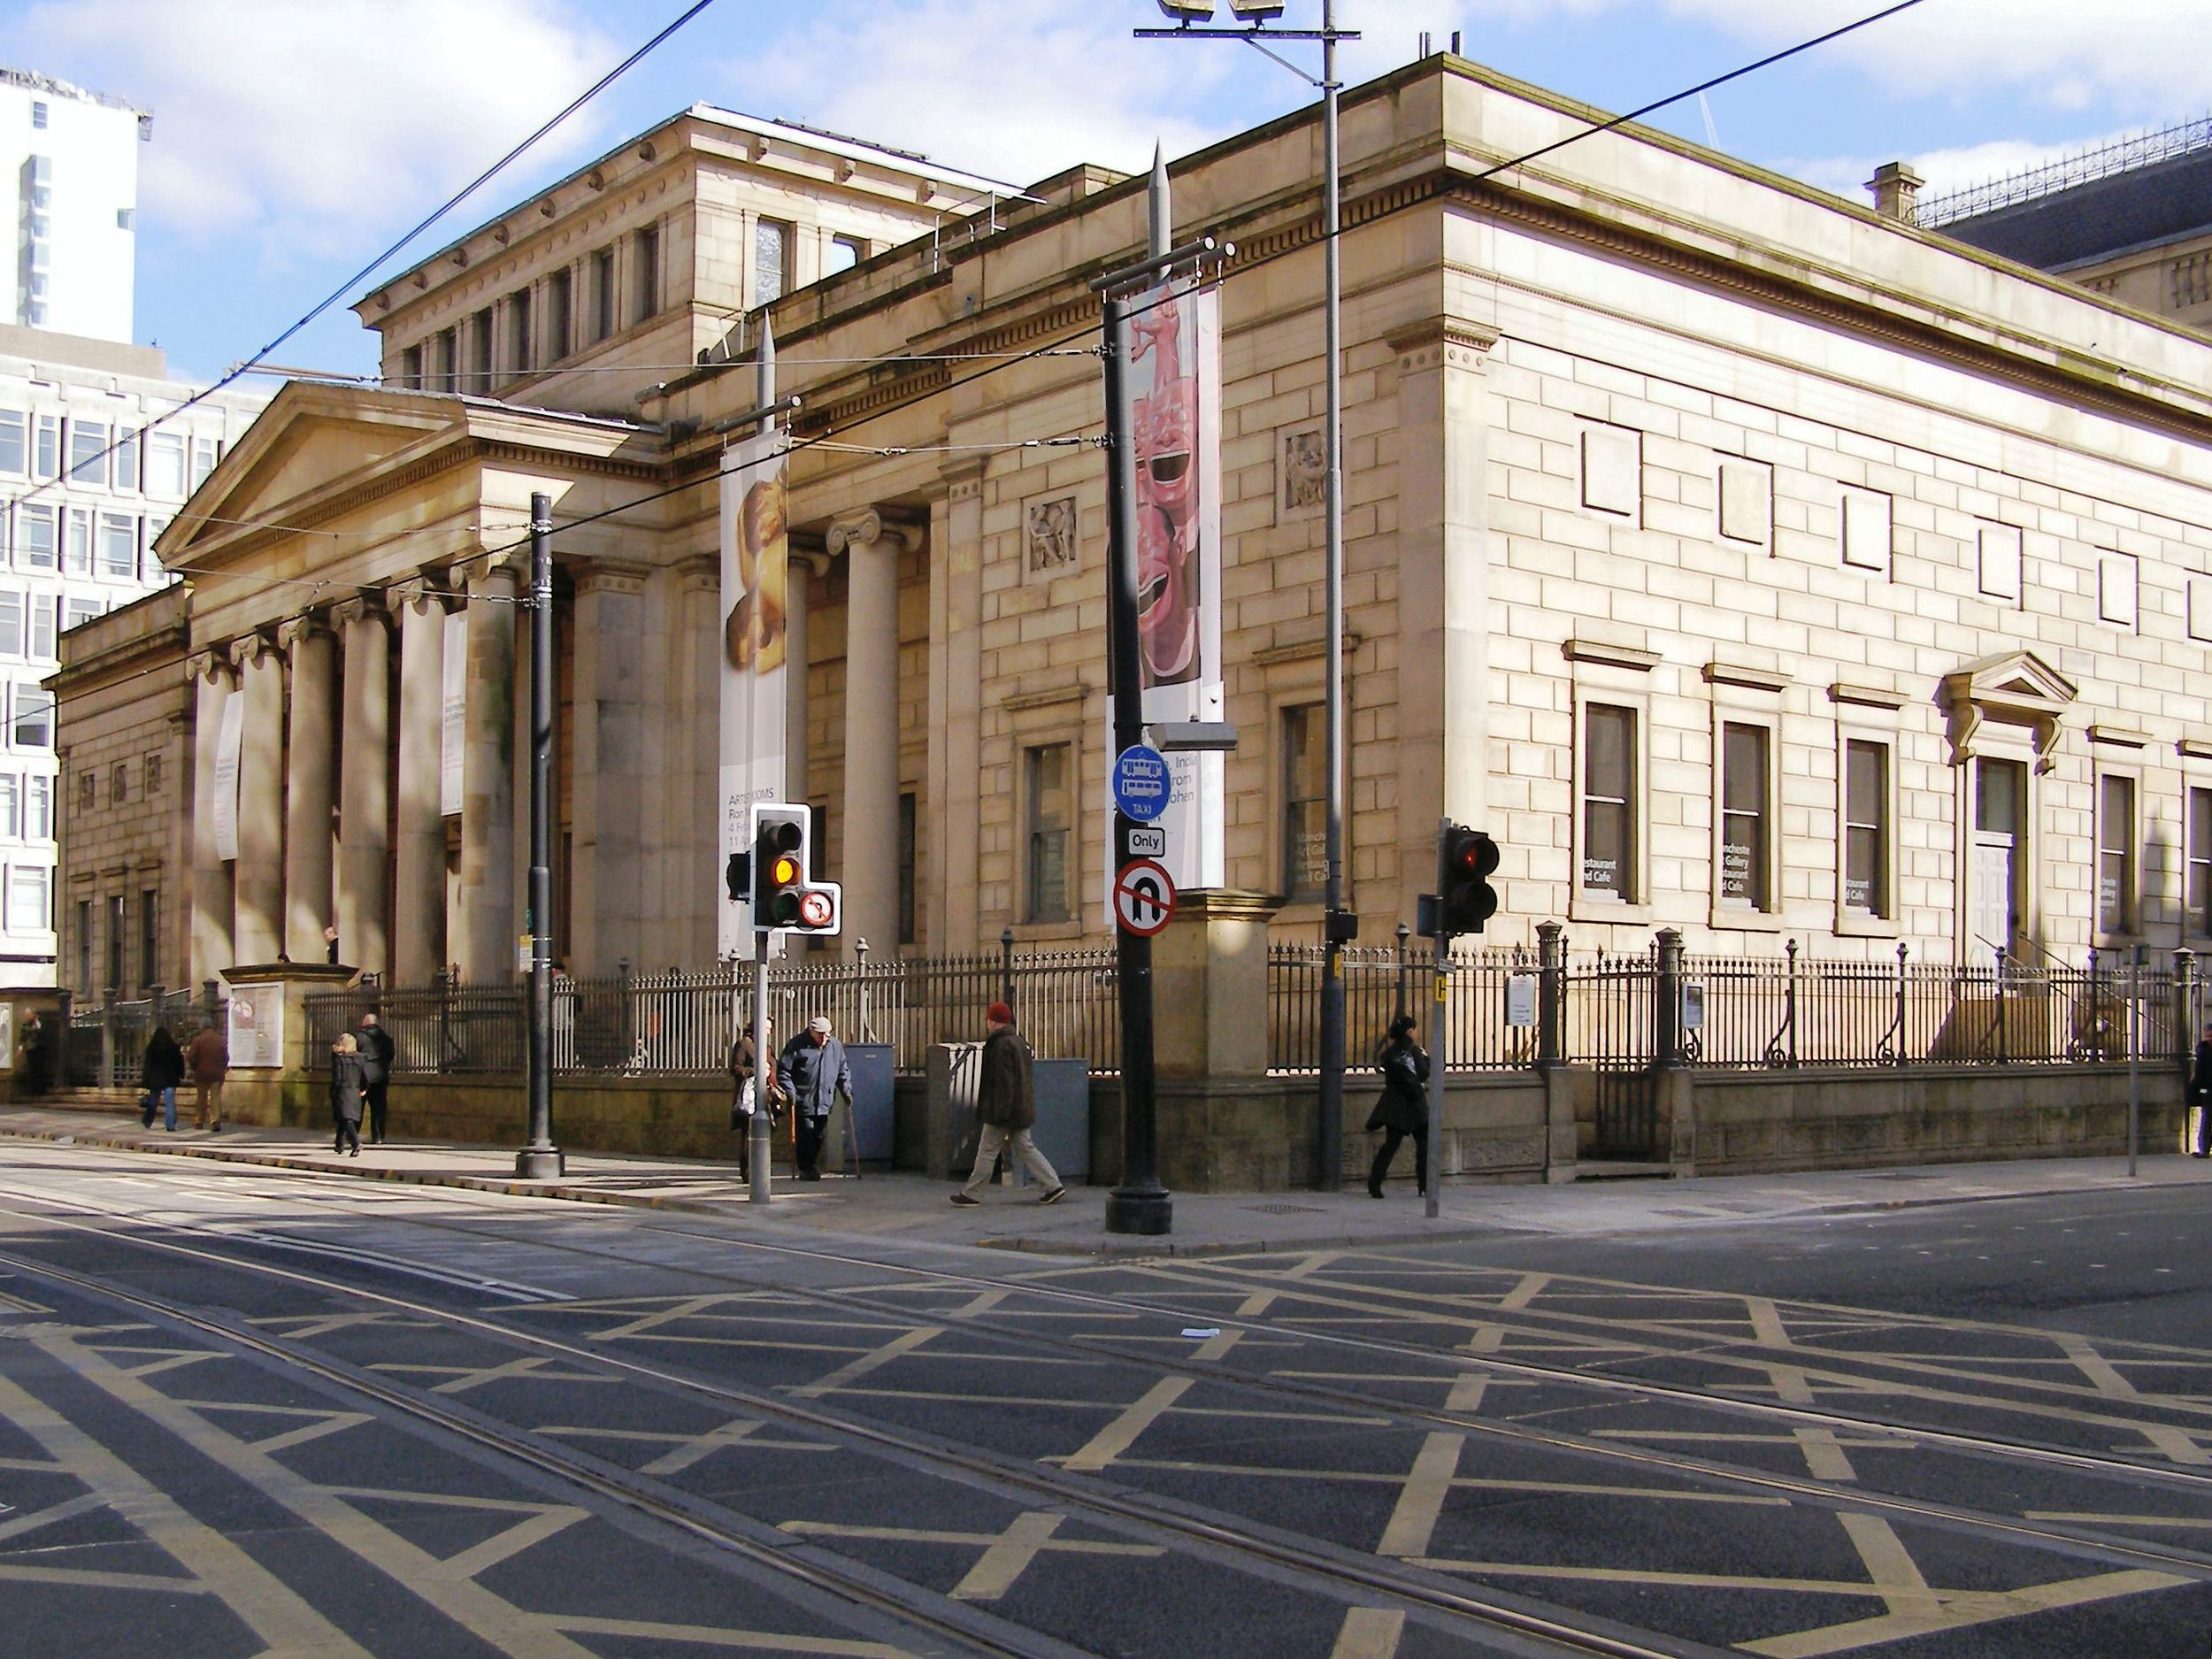 source:https://upload.wikimedia.org/wikipedia/commons/e/e7/Manchester_Art_Gallery_-_geograph.org.uk_-_1748756.jpg